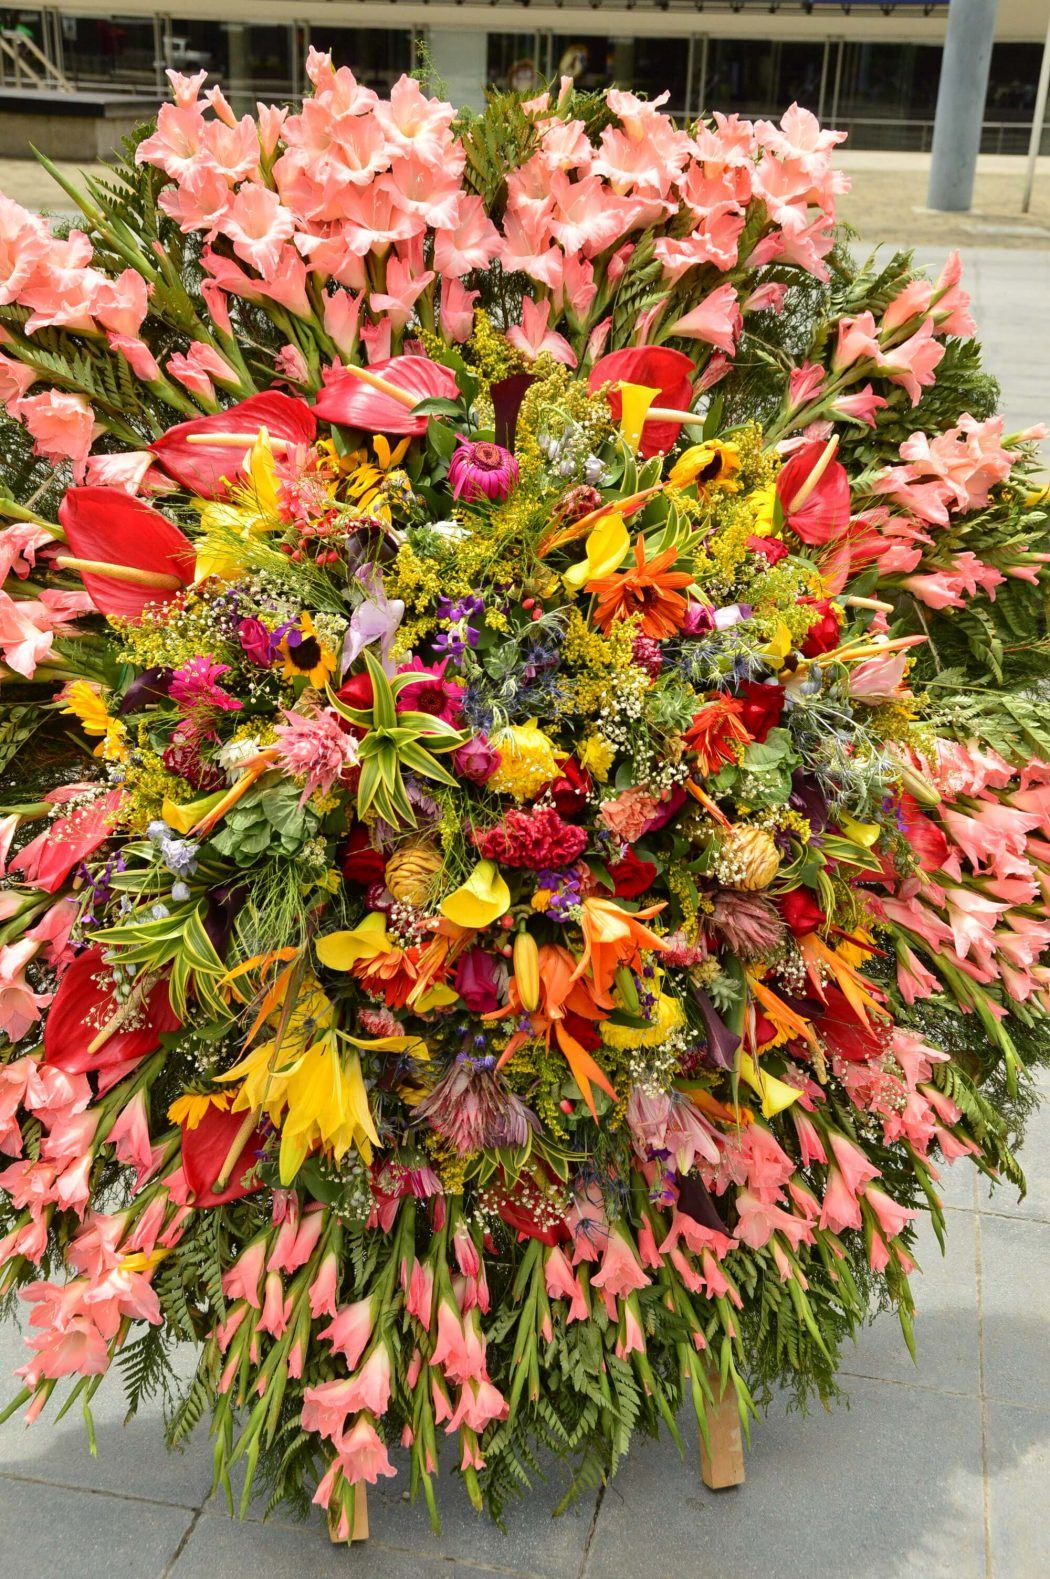 floral display at plaza mayor